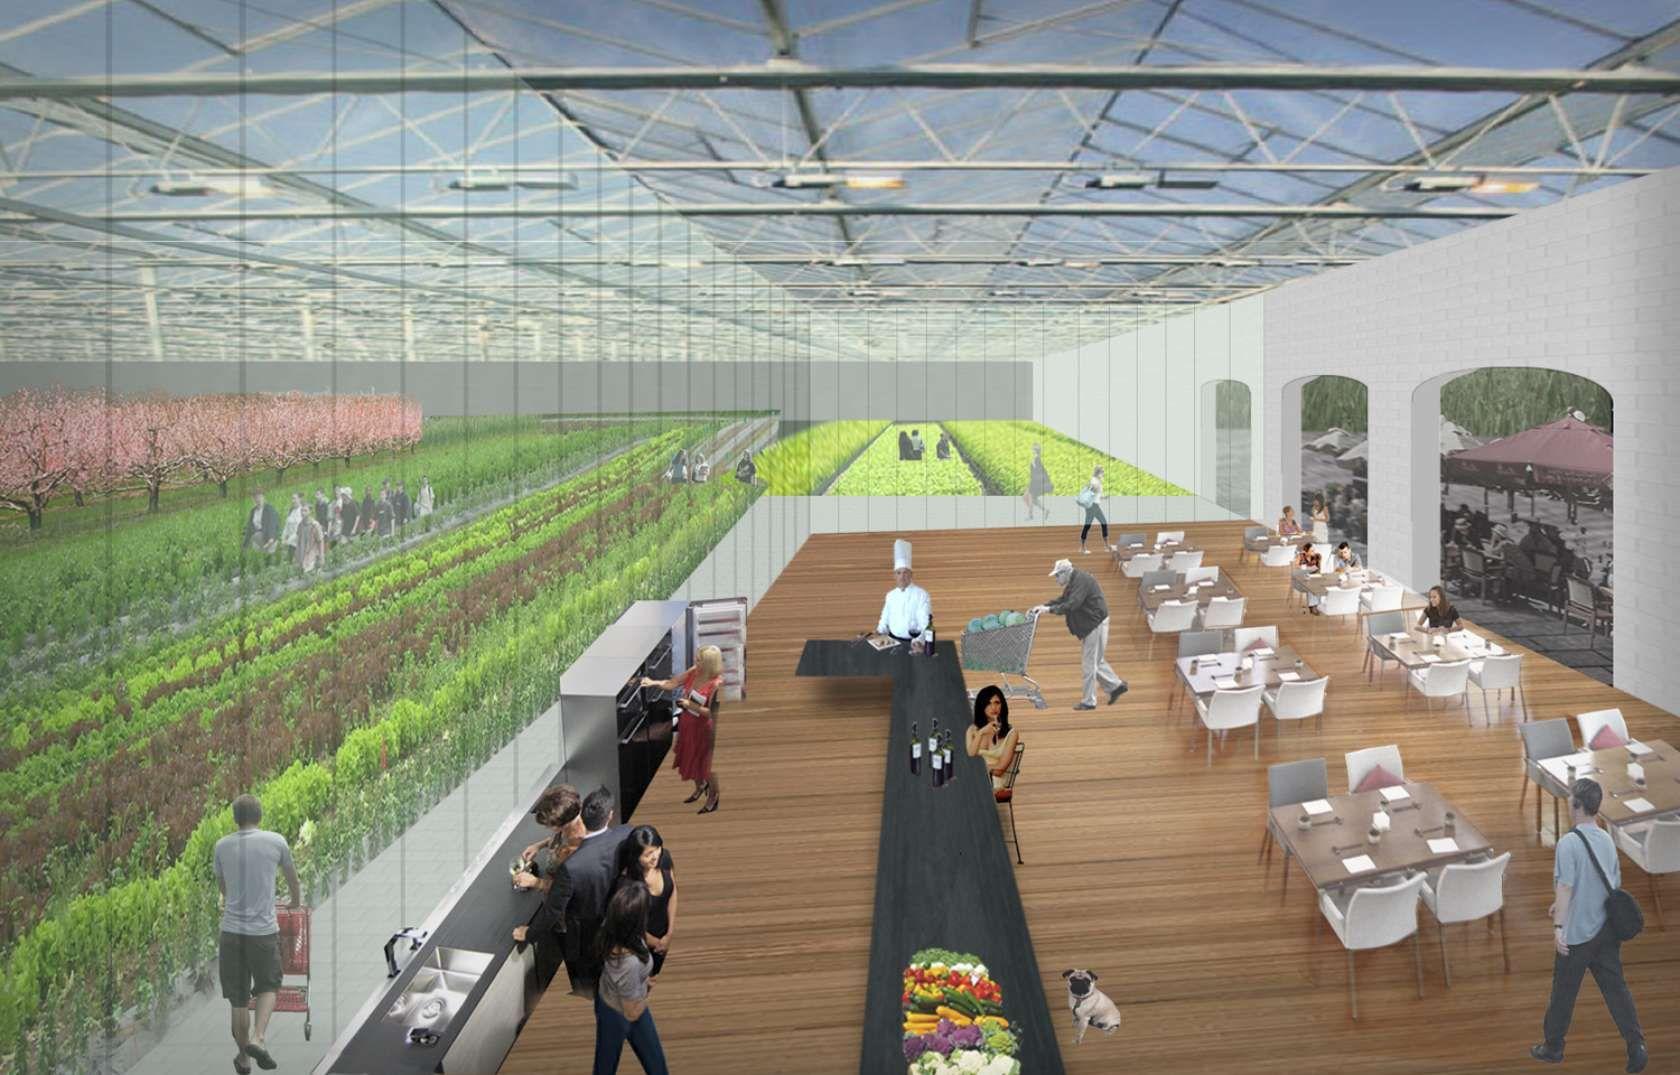 Greenhouse Restaurant Greenhouse Restaurant Commercial